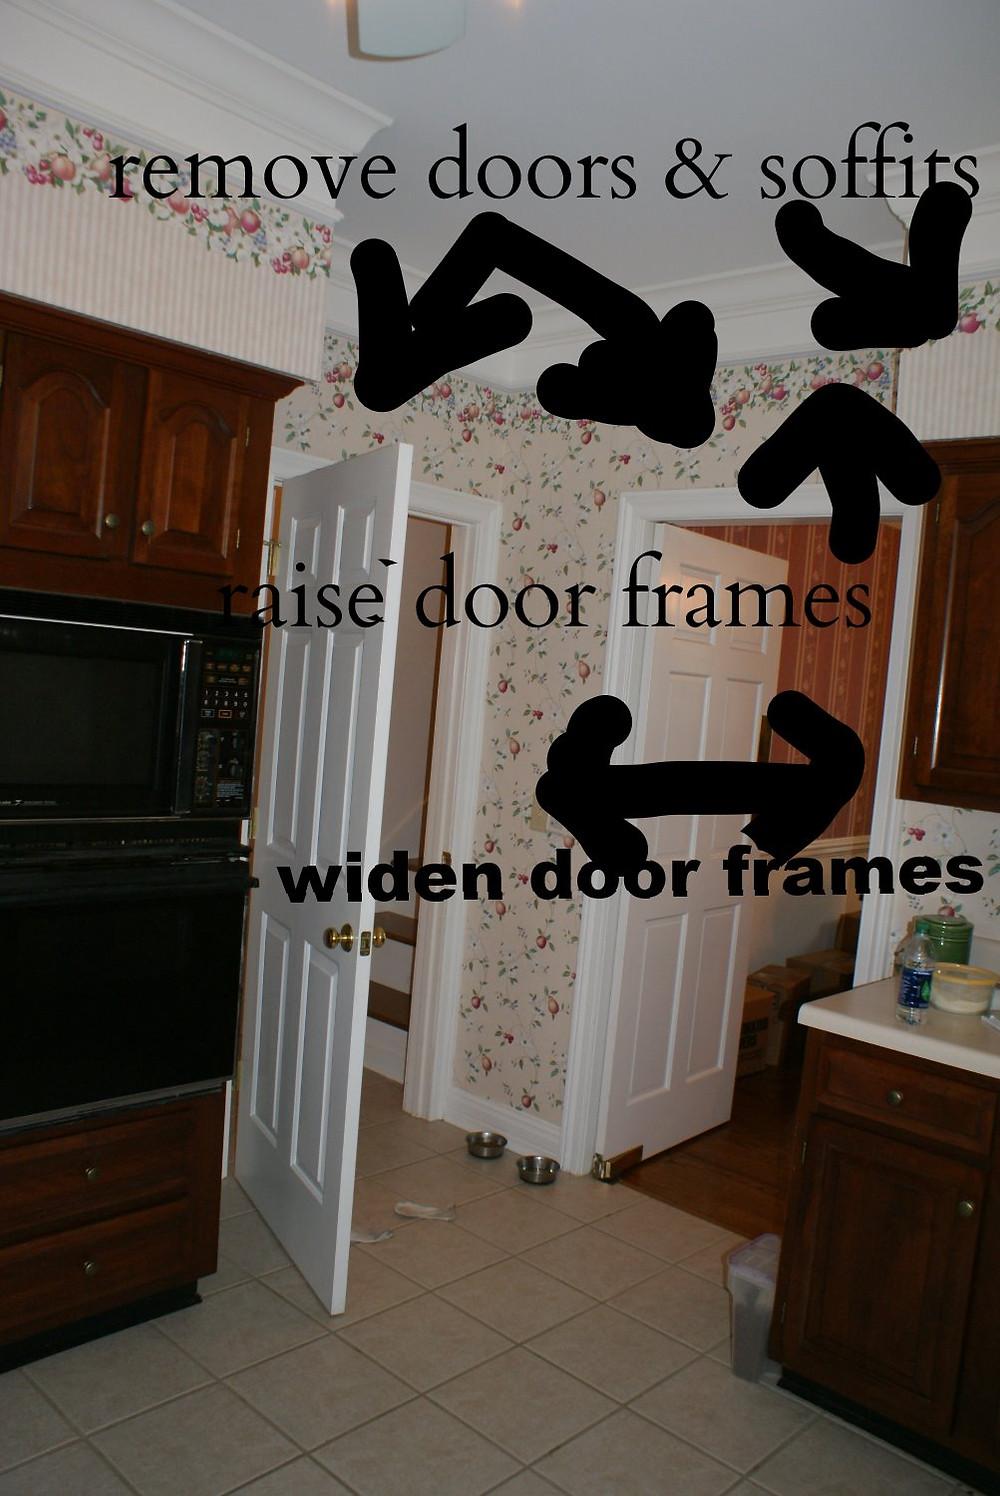 remove doors and soffits, raise and widen door frames